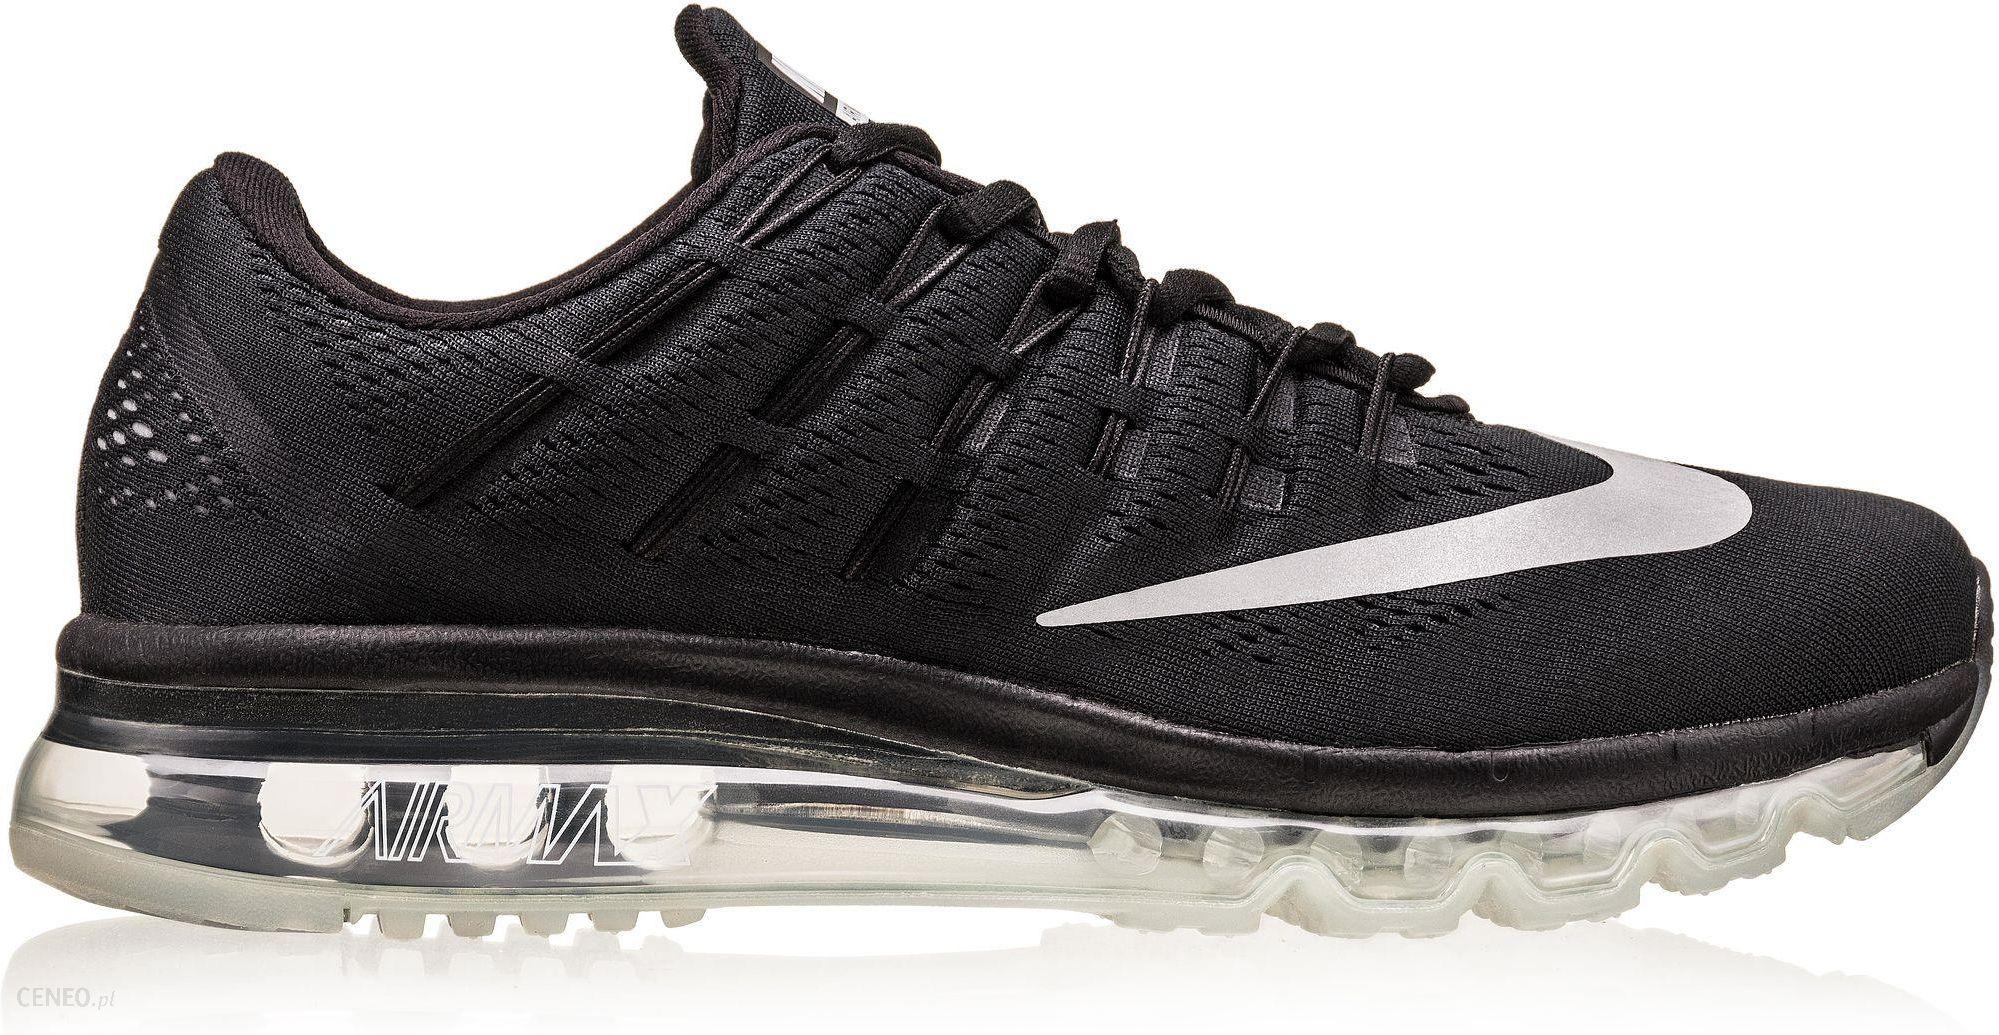 Nike Air Max 2016 Damskie Buty Do Biegania Obsidian